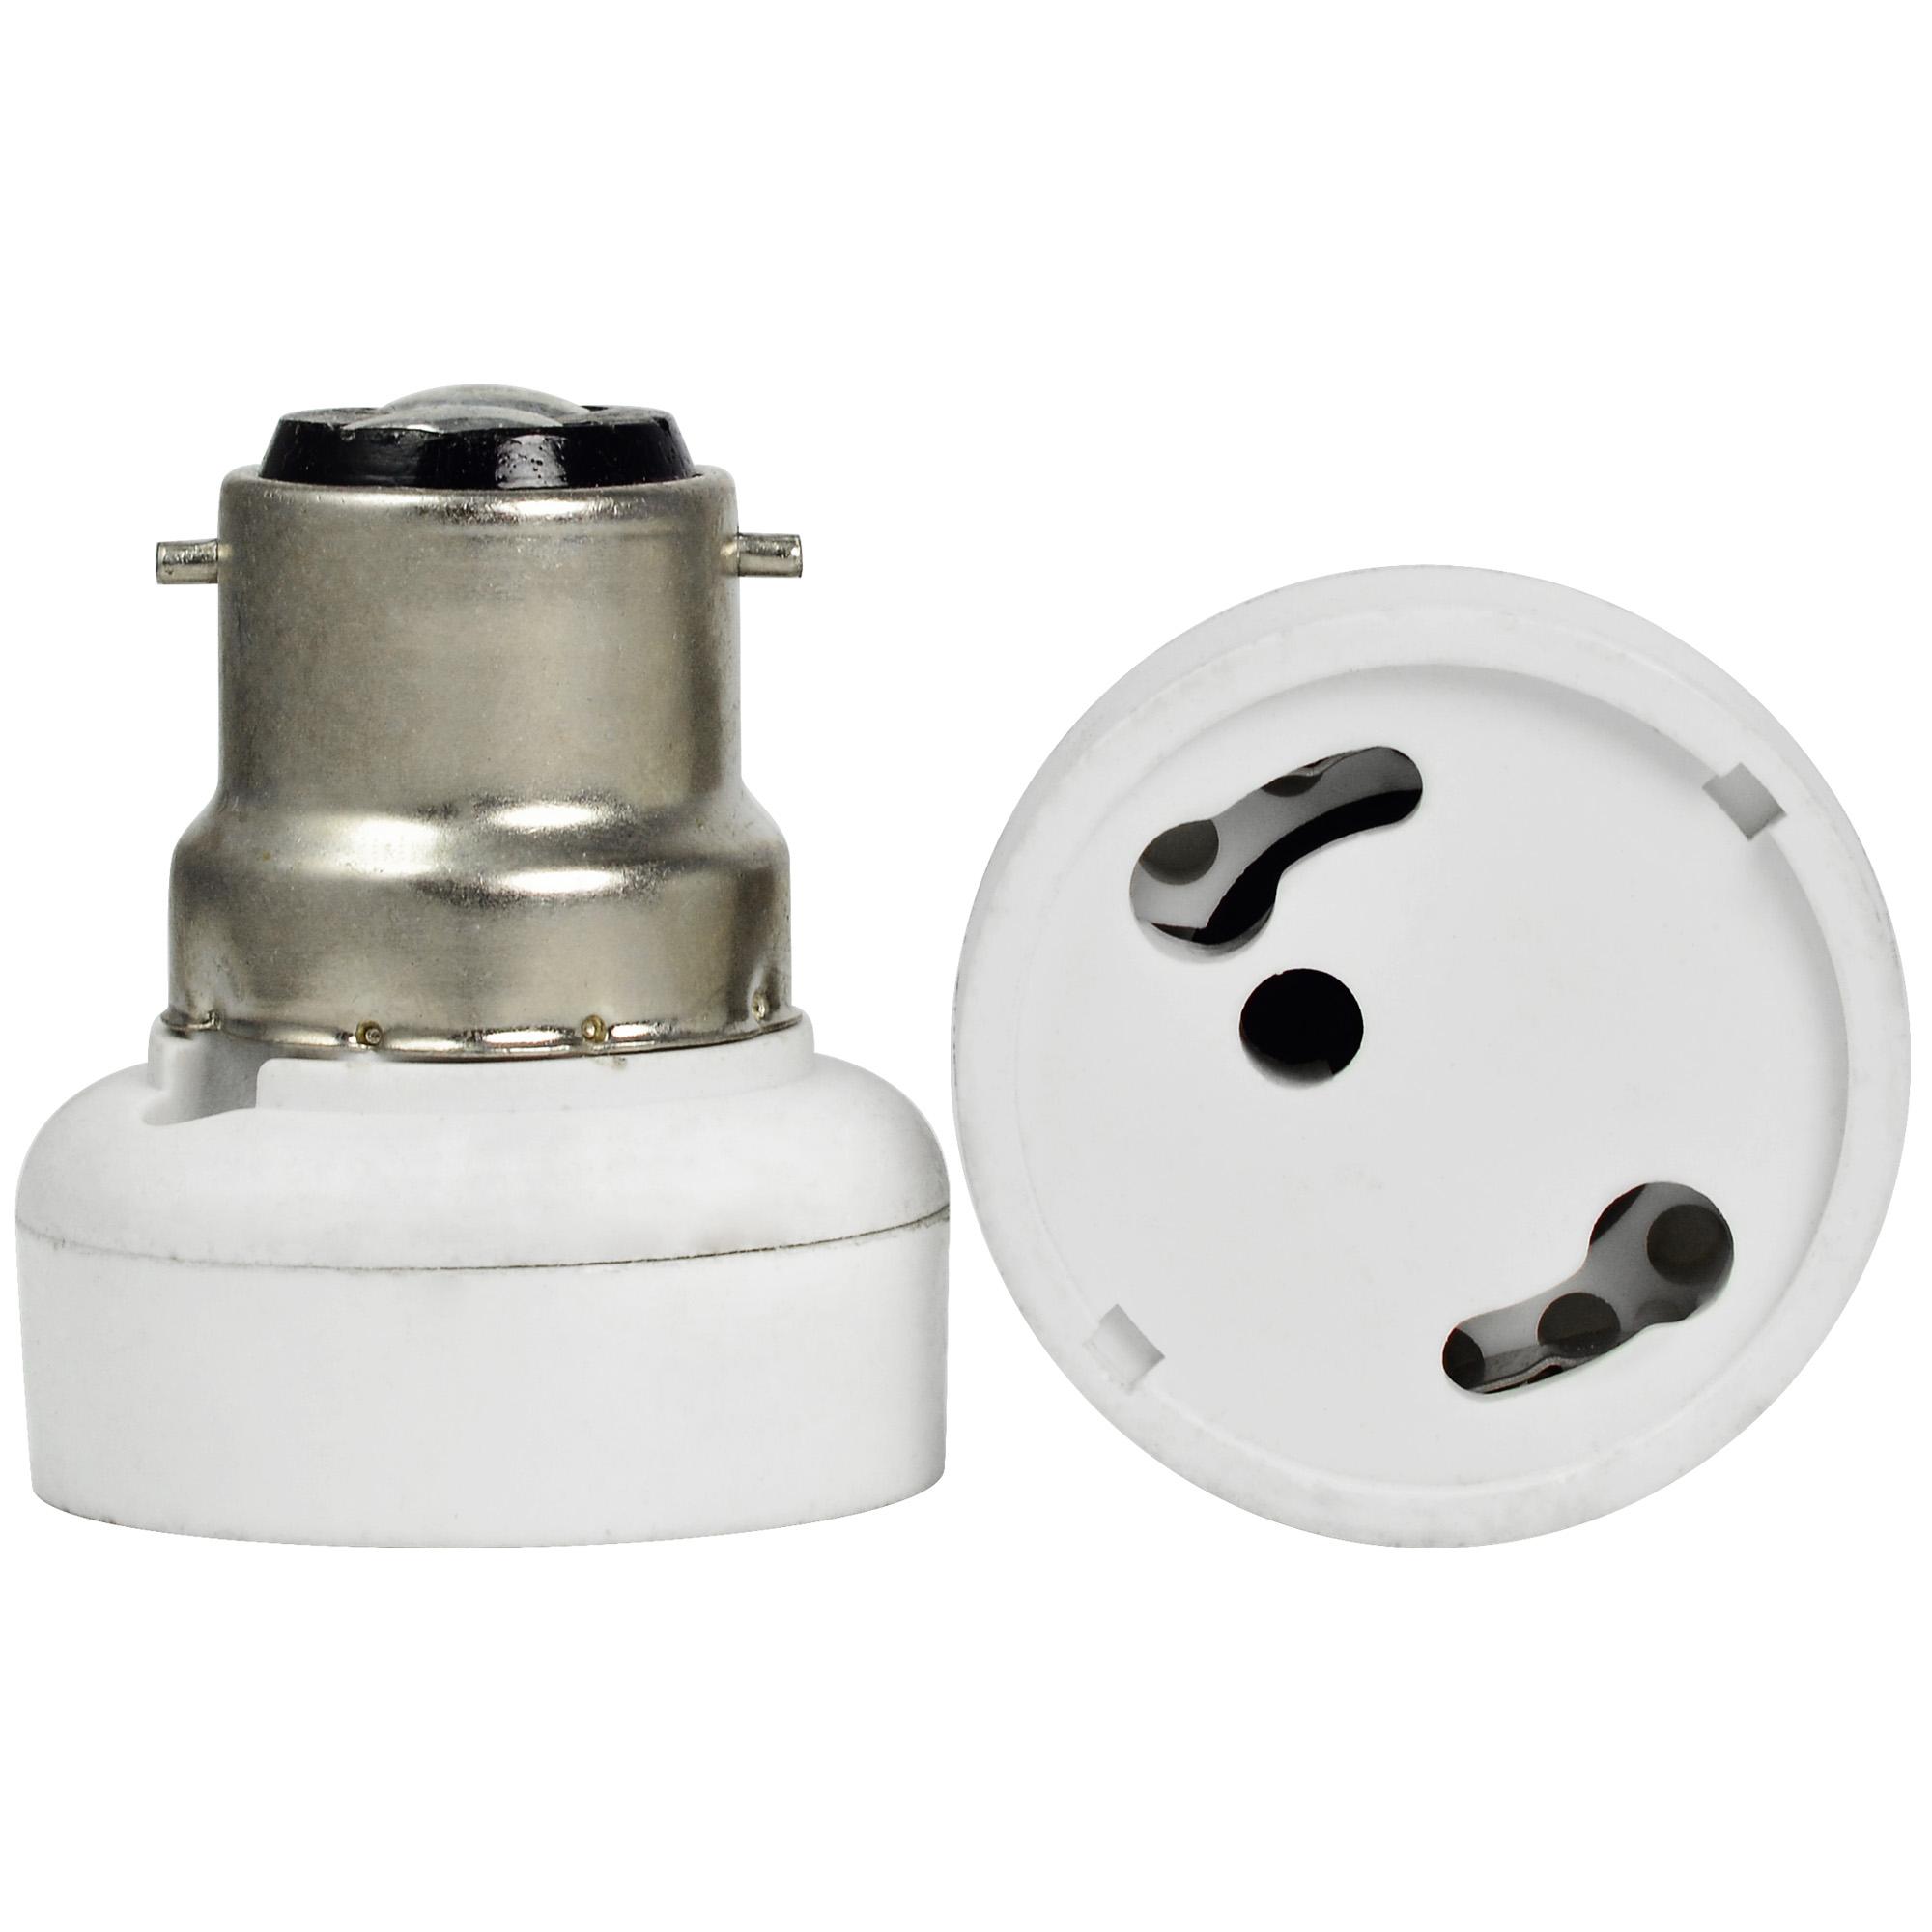 mengsled u2013 mengs high quality lamp base adapter b22 to gu24 led light bulb socket converter - Gu24 Led